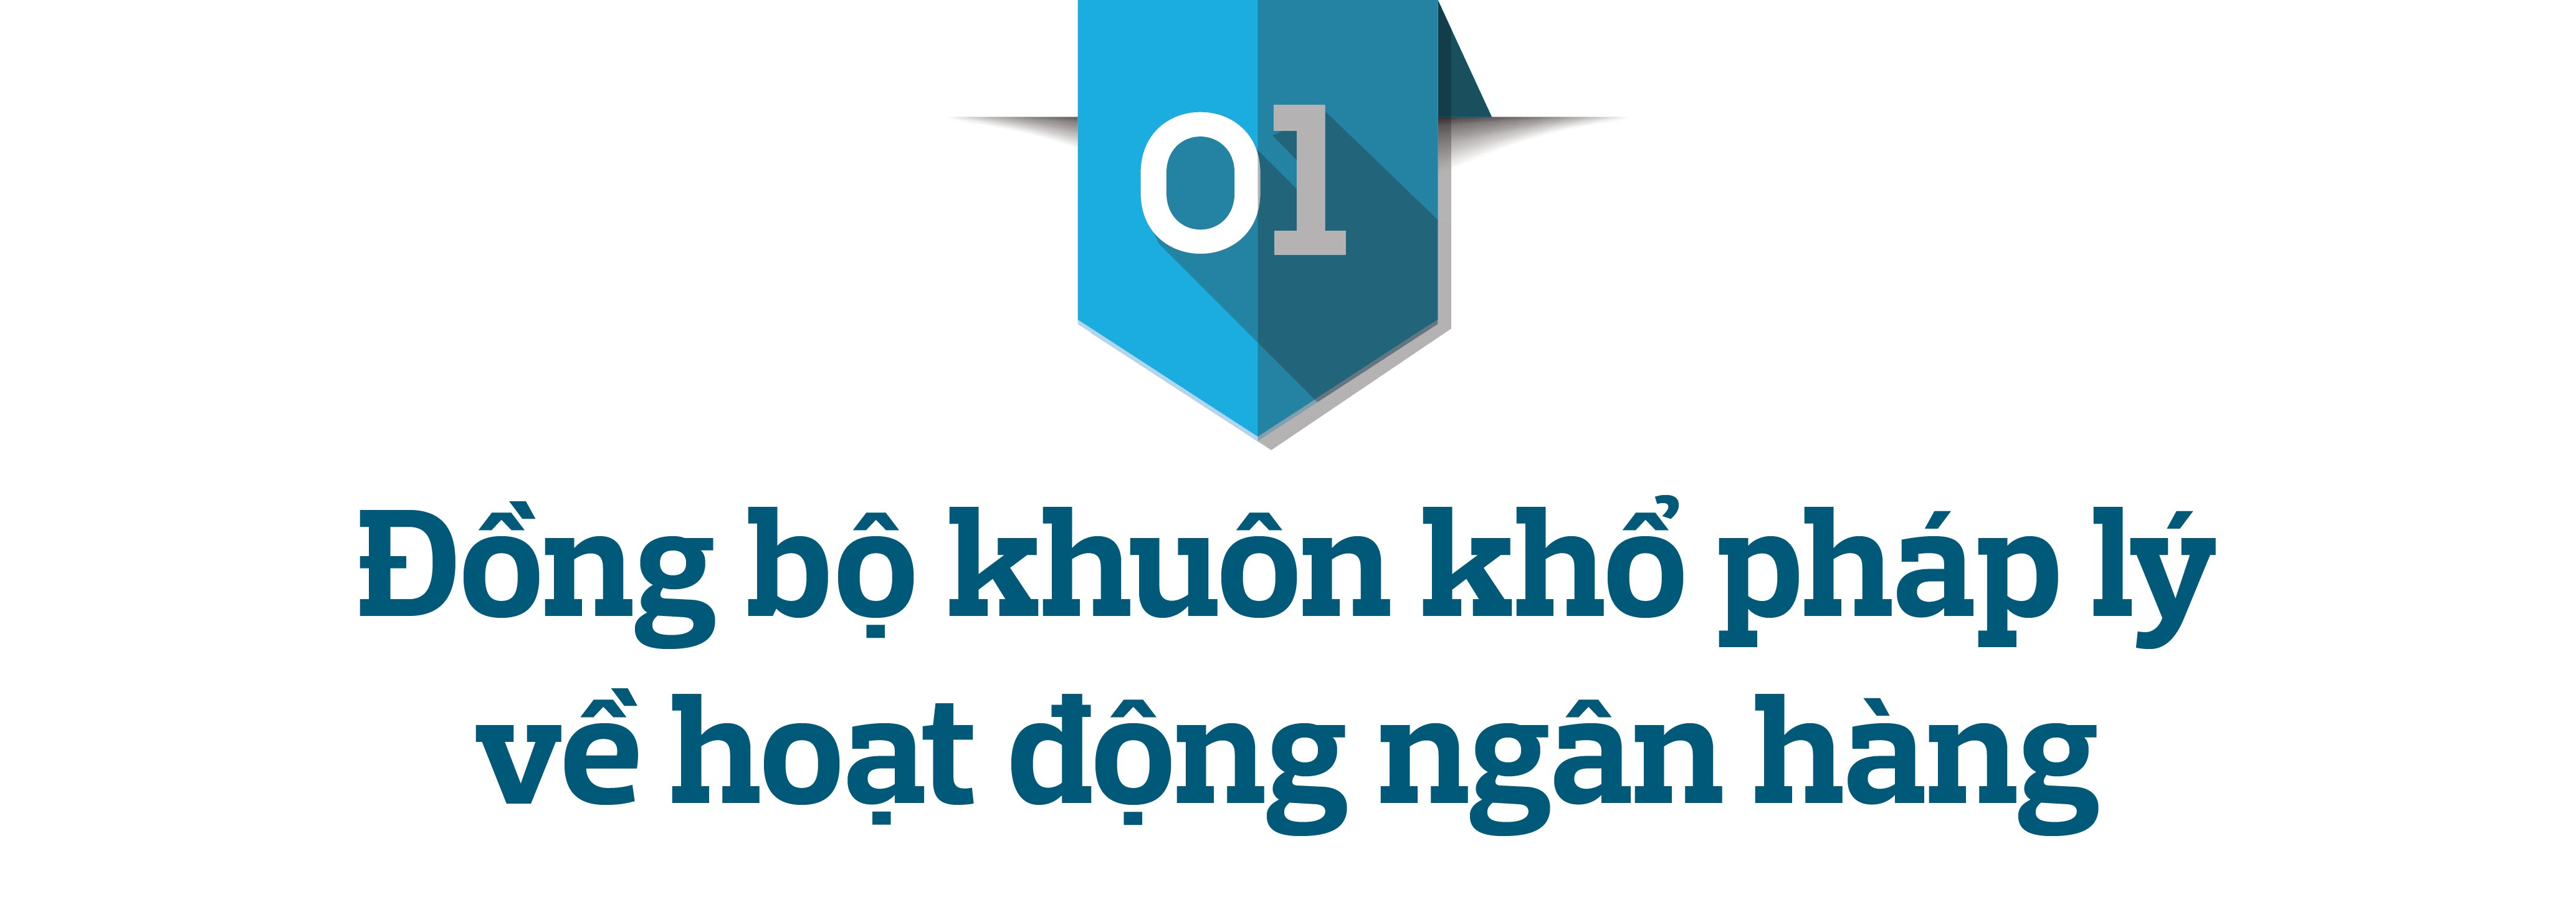 chinh sach tien te gop phan thuc hien thang loi nghi quyet dai hoi xii cua dang